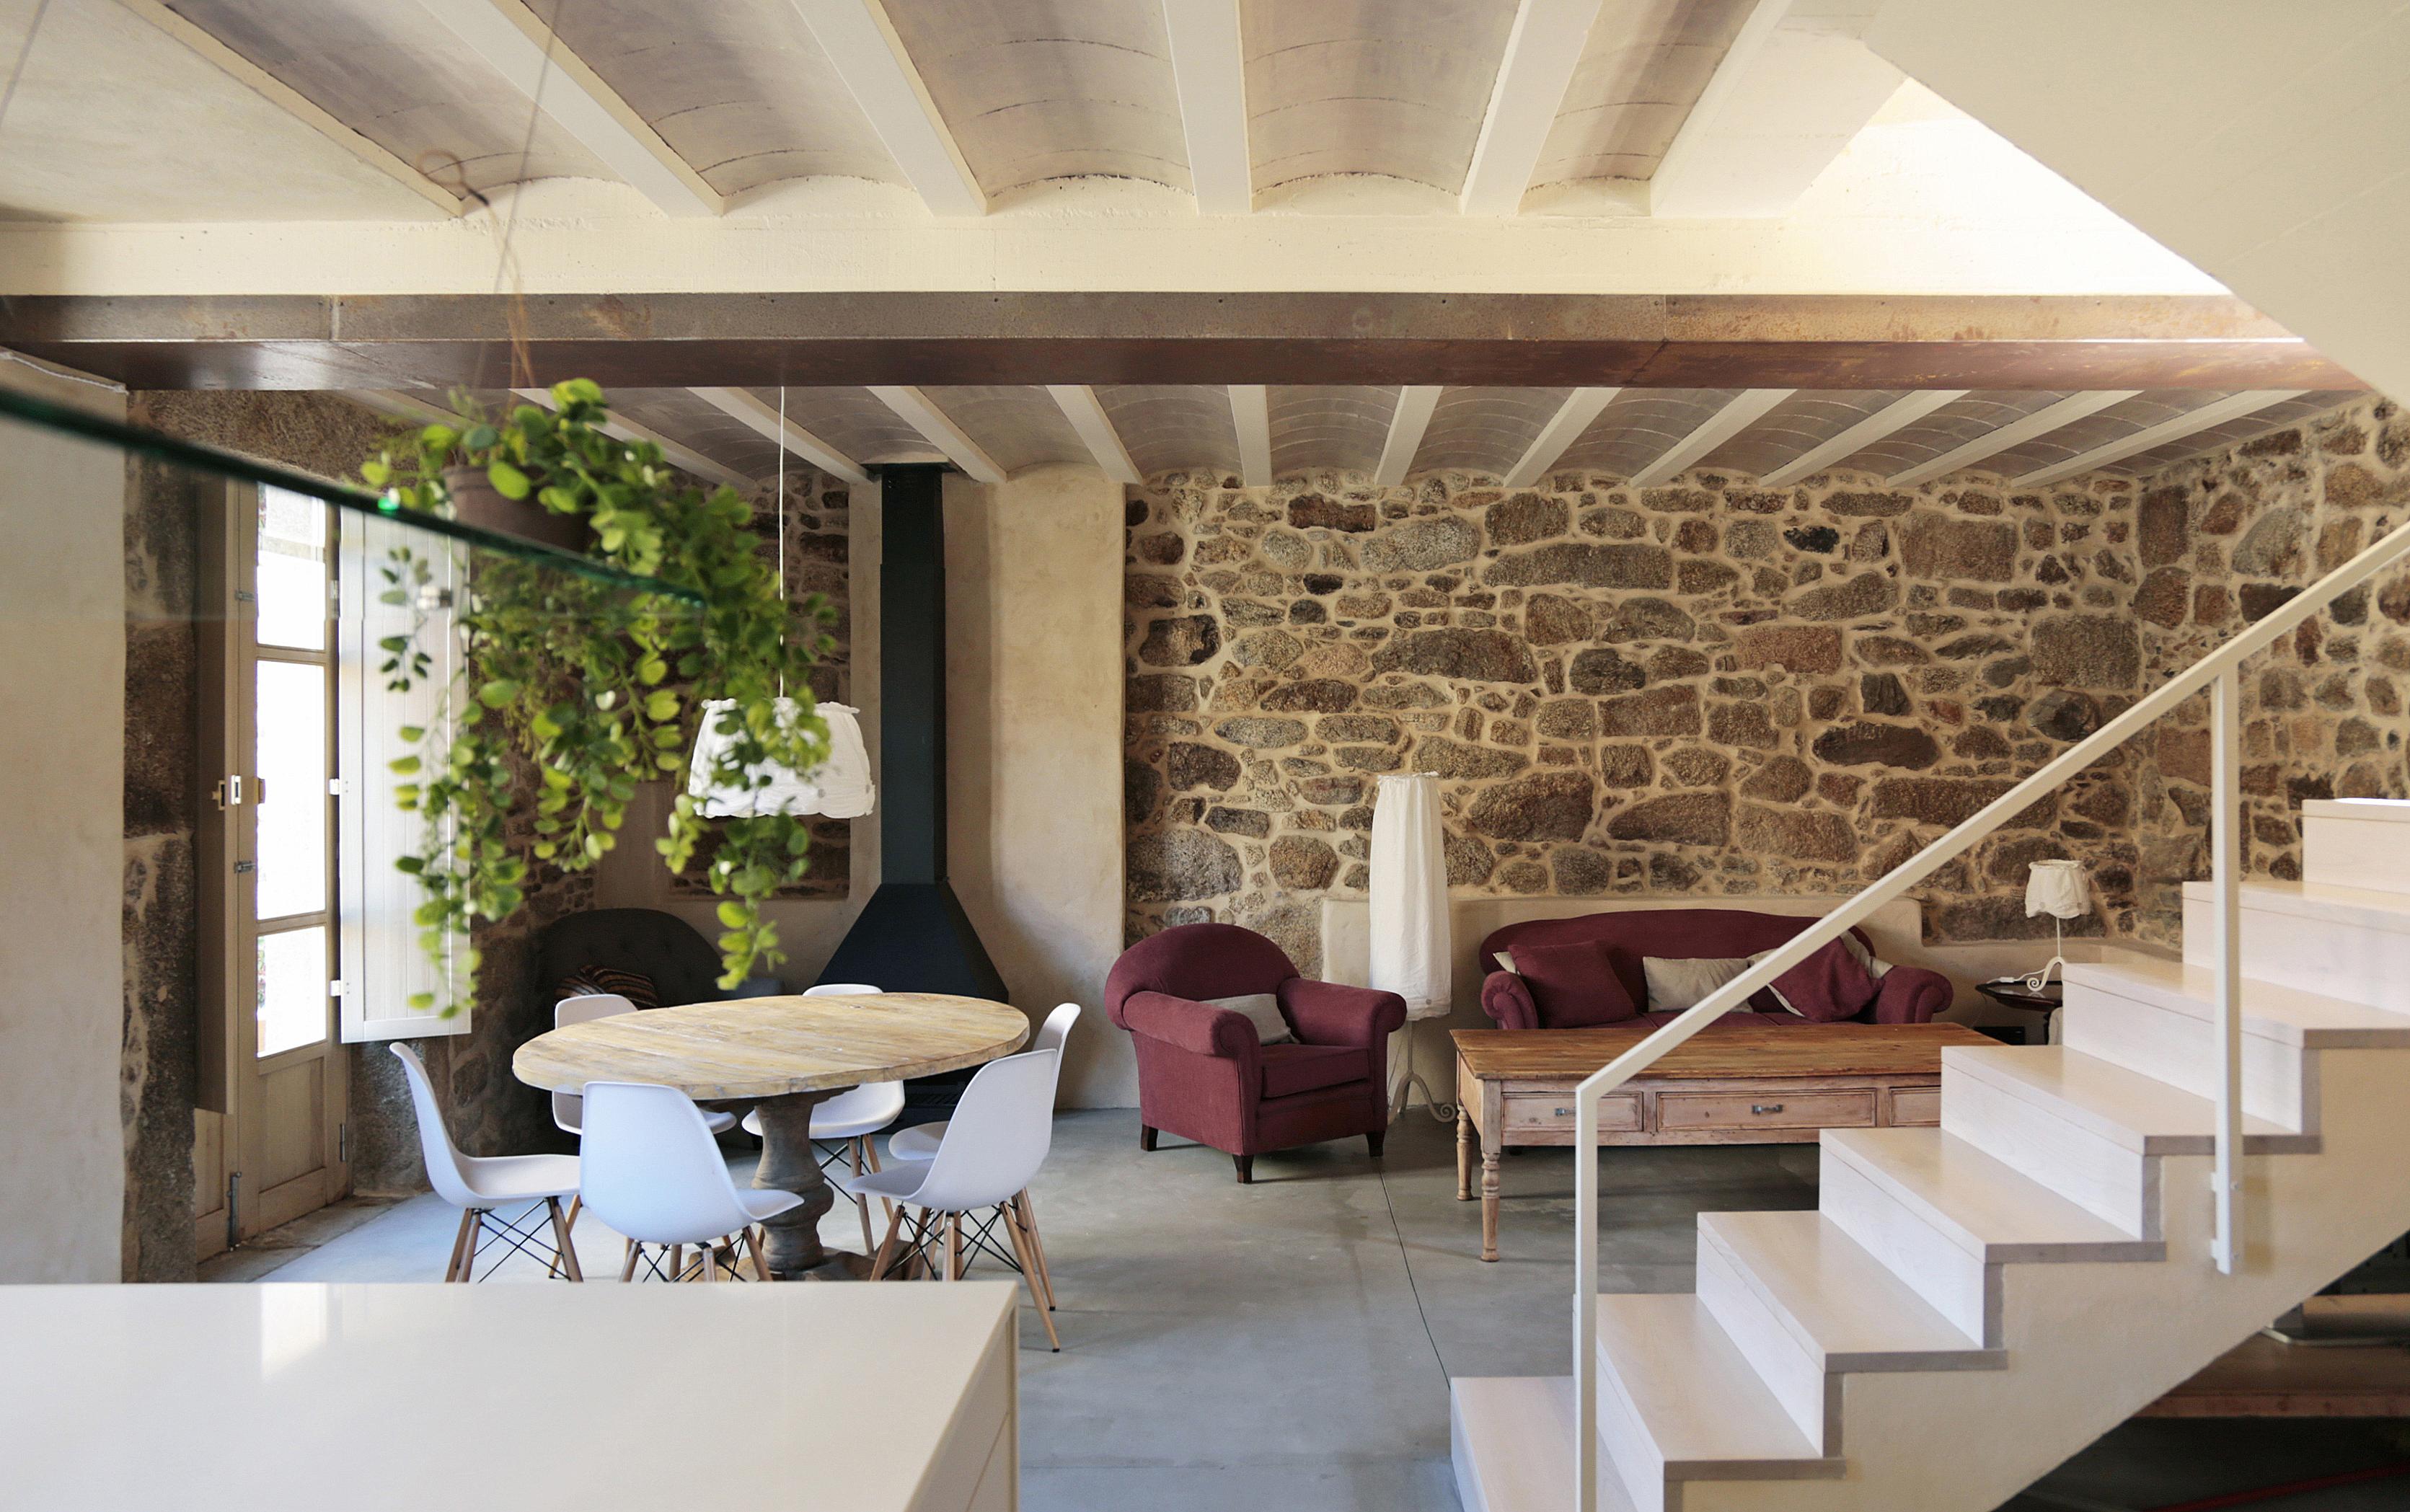 Rehabilitaci n de una casa en carnota dom arquitectura for Casa y ideas